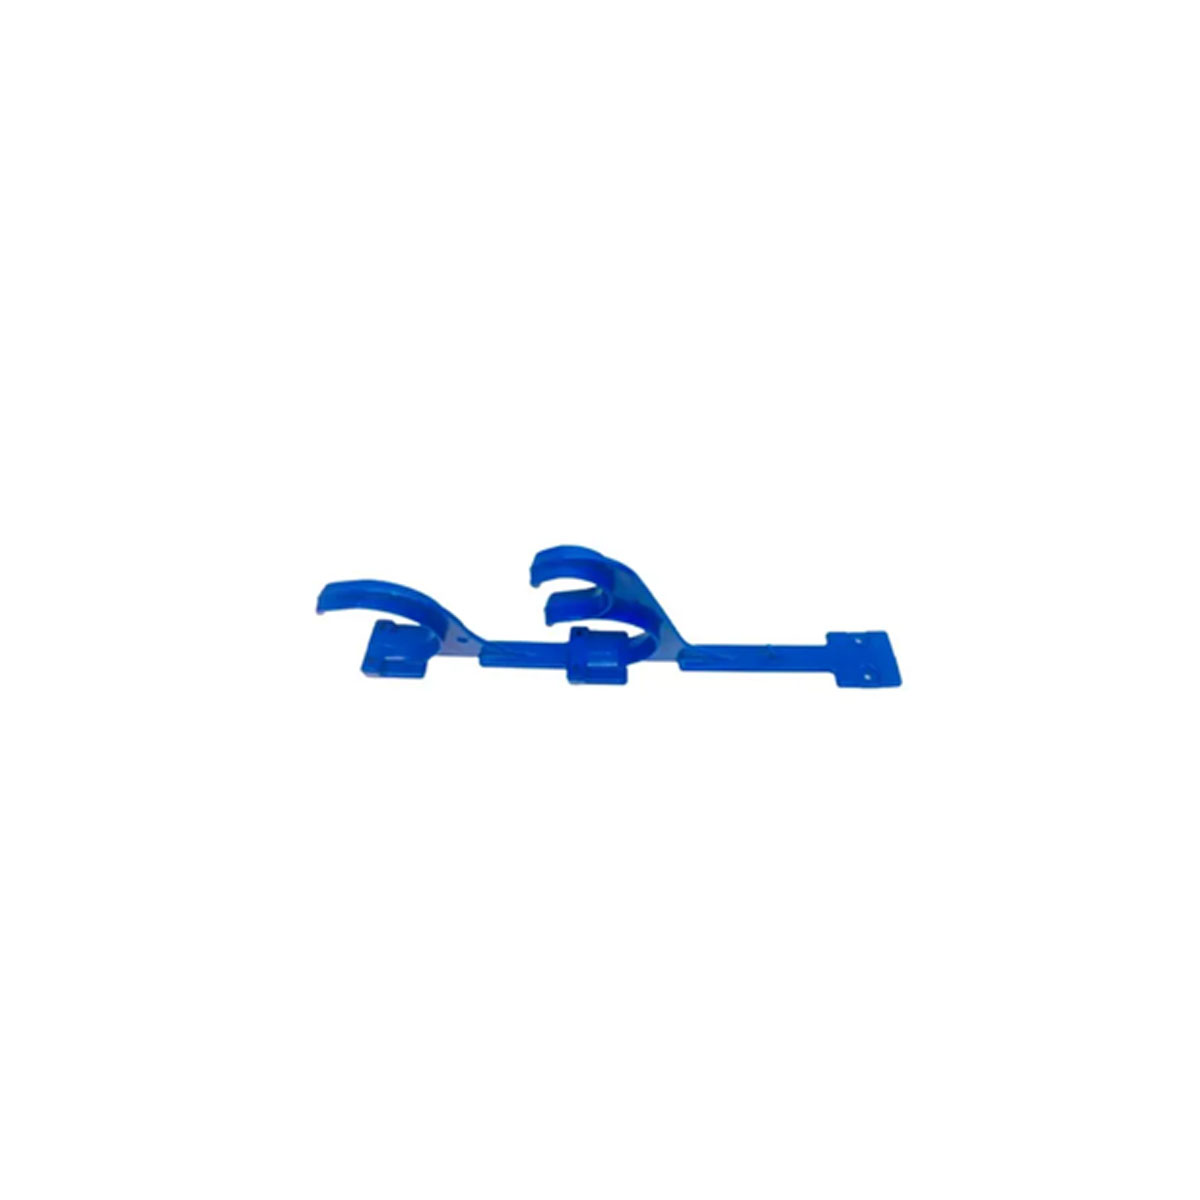 Suporte plástico para cabo/peneira aspirador Sodramar